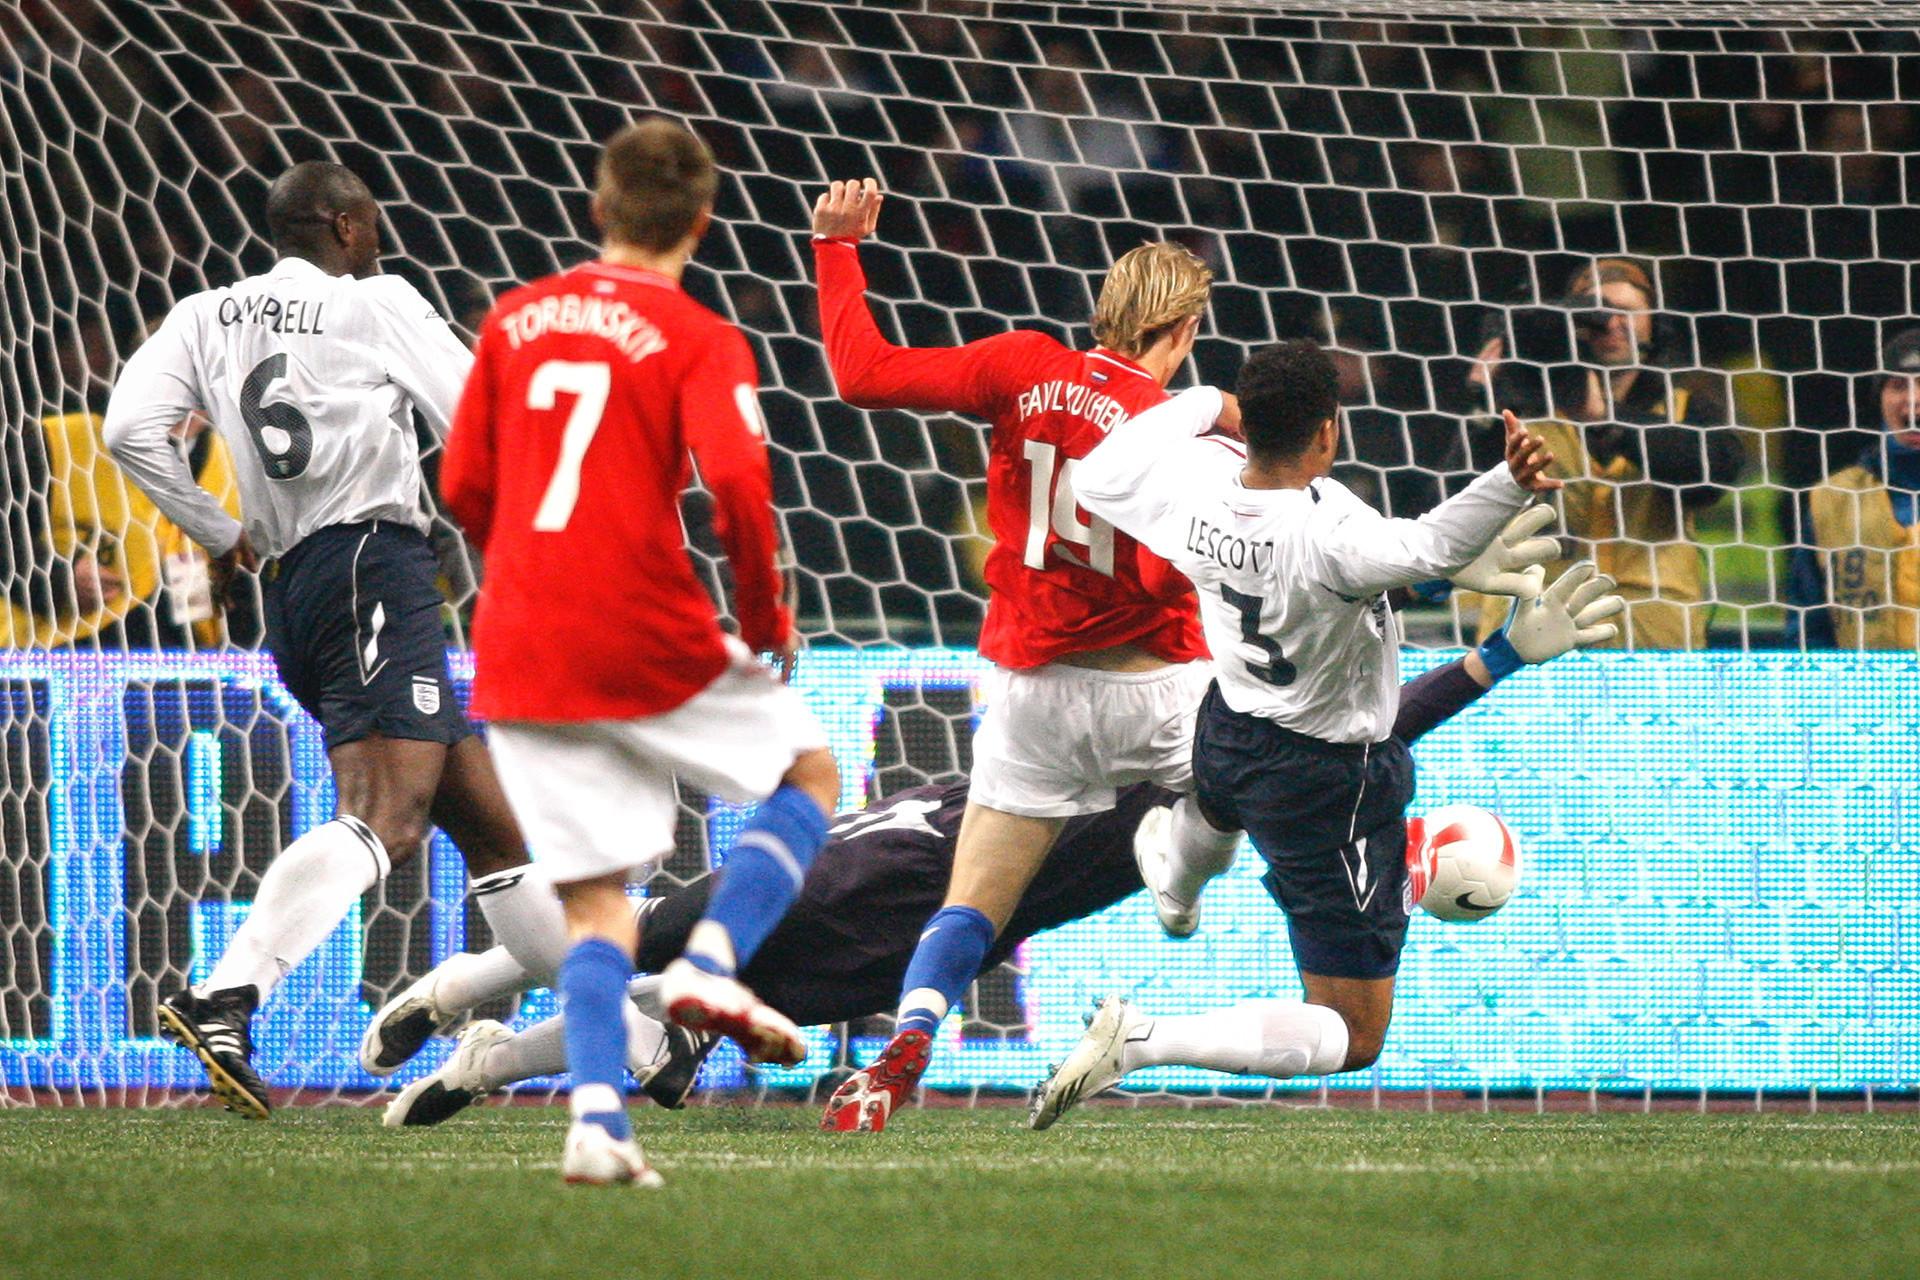 Roman Pavlyuchenko mencetak gol dalam pertandingan melawan Inggris (2-1). Kemenangan ini membawa Rusia ke Euro, meninggalkan tim Inggris di belakang.